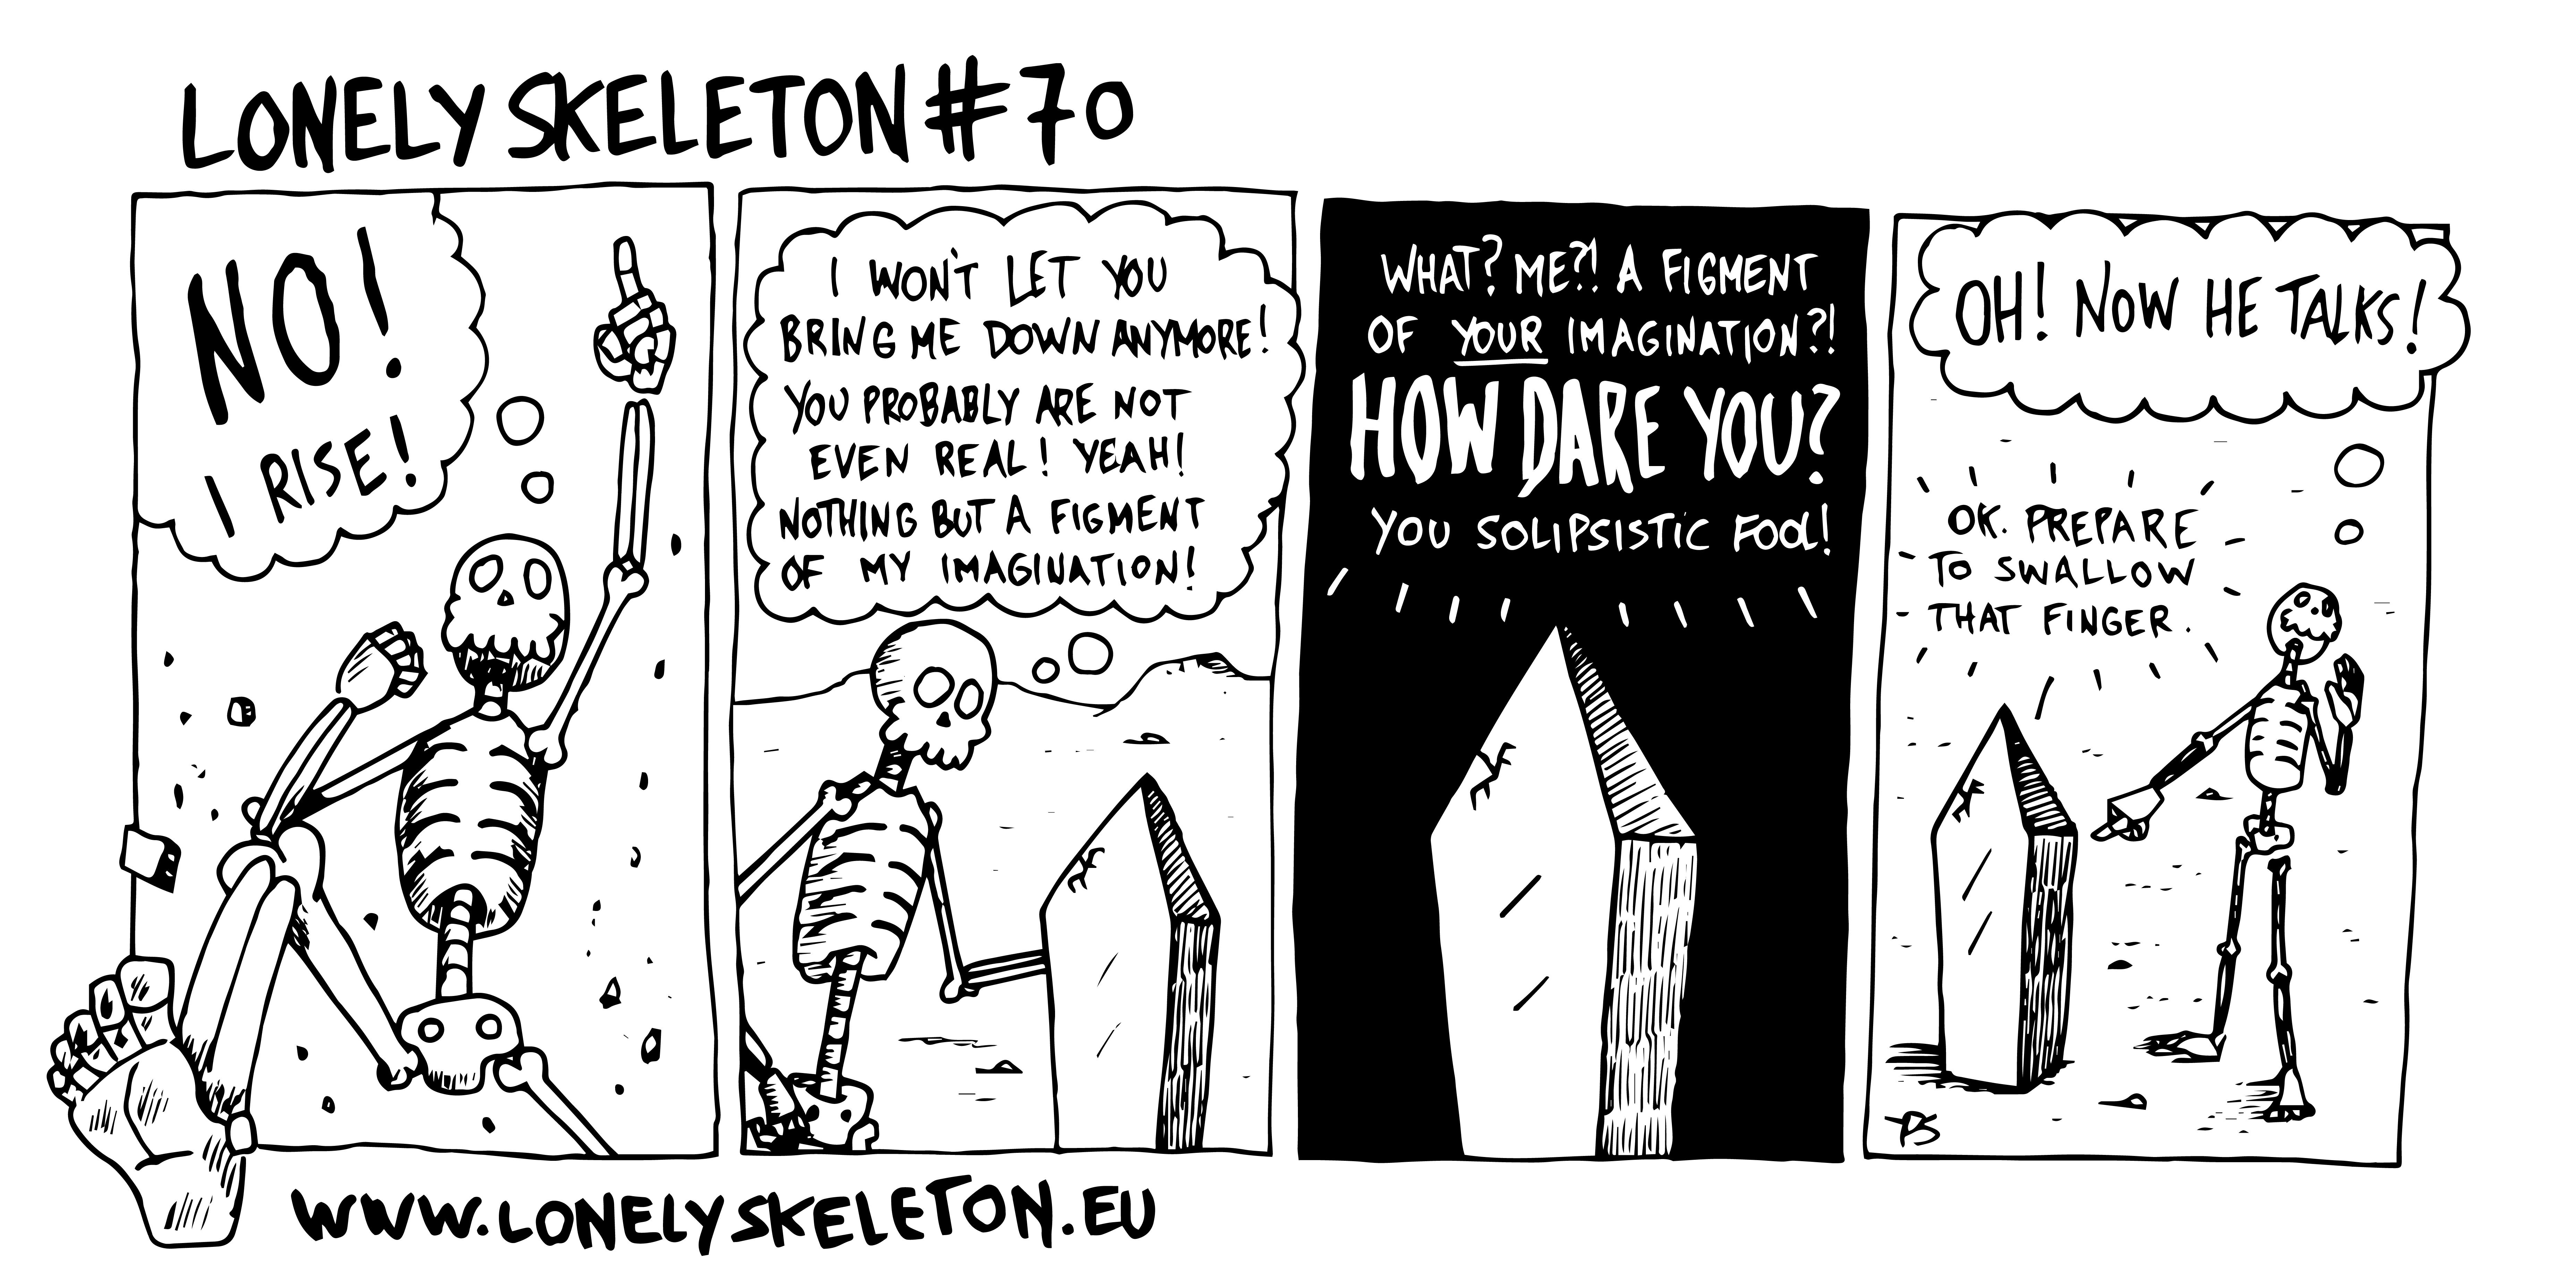 Lonely Skeleton #70